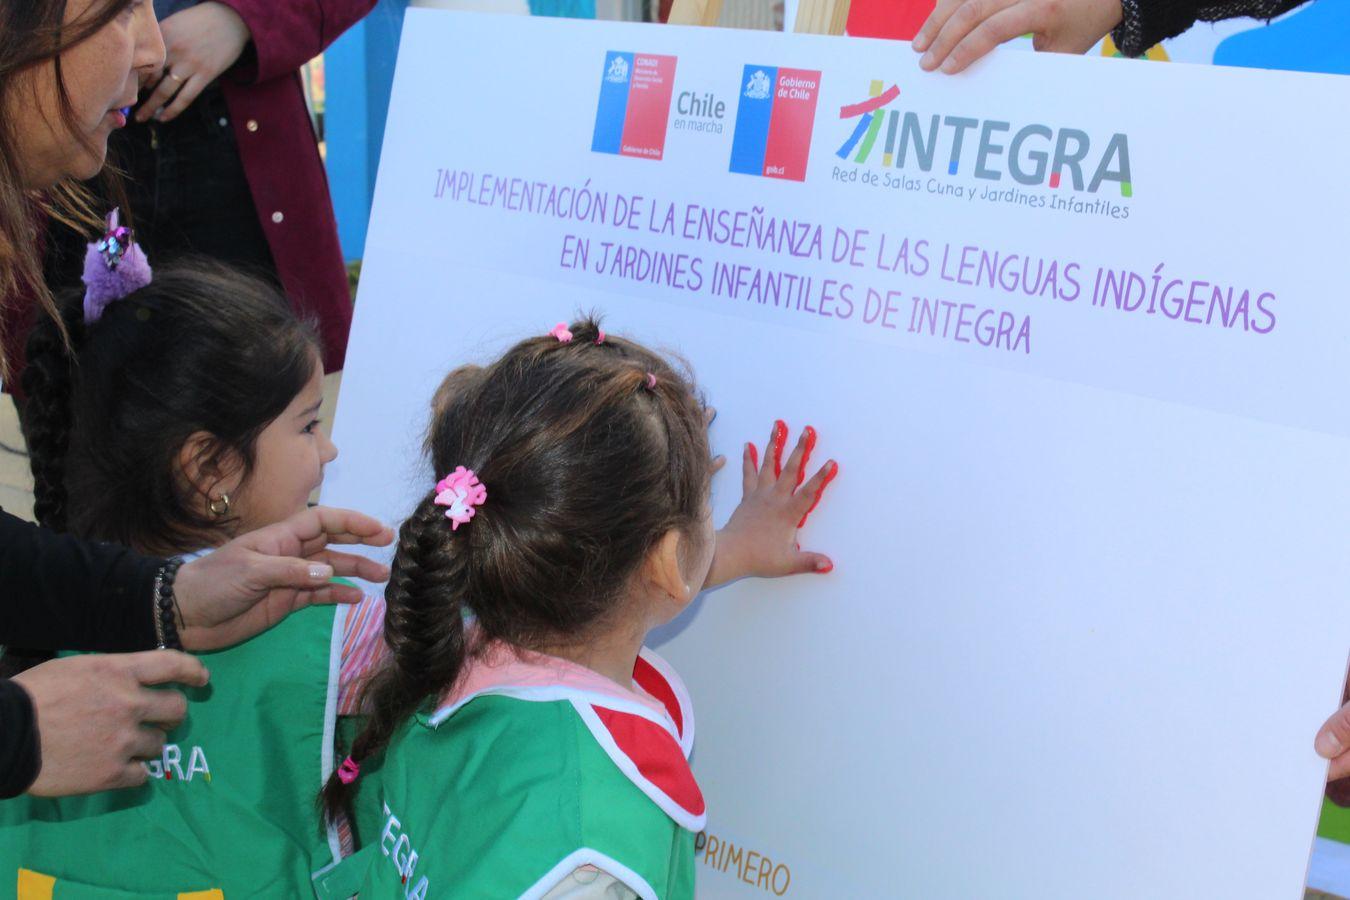 conadi-fundacion-integra-coquimbo-pueblos-originarios-05092019 (8)